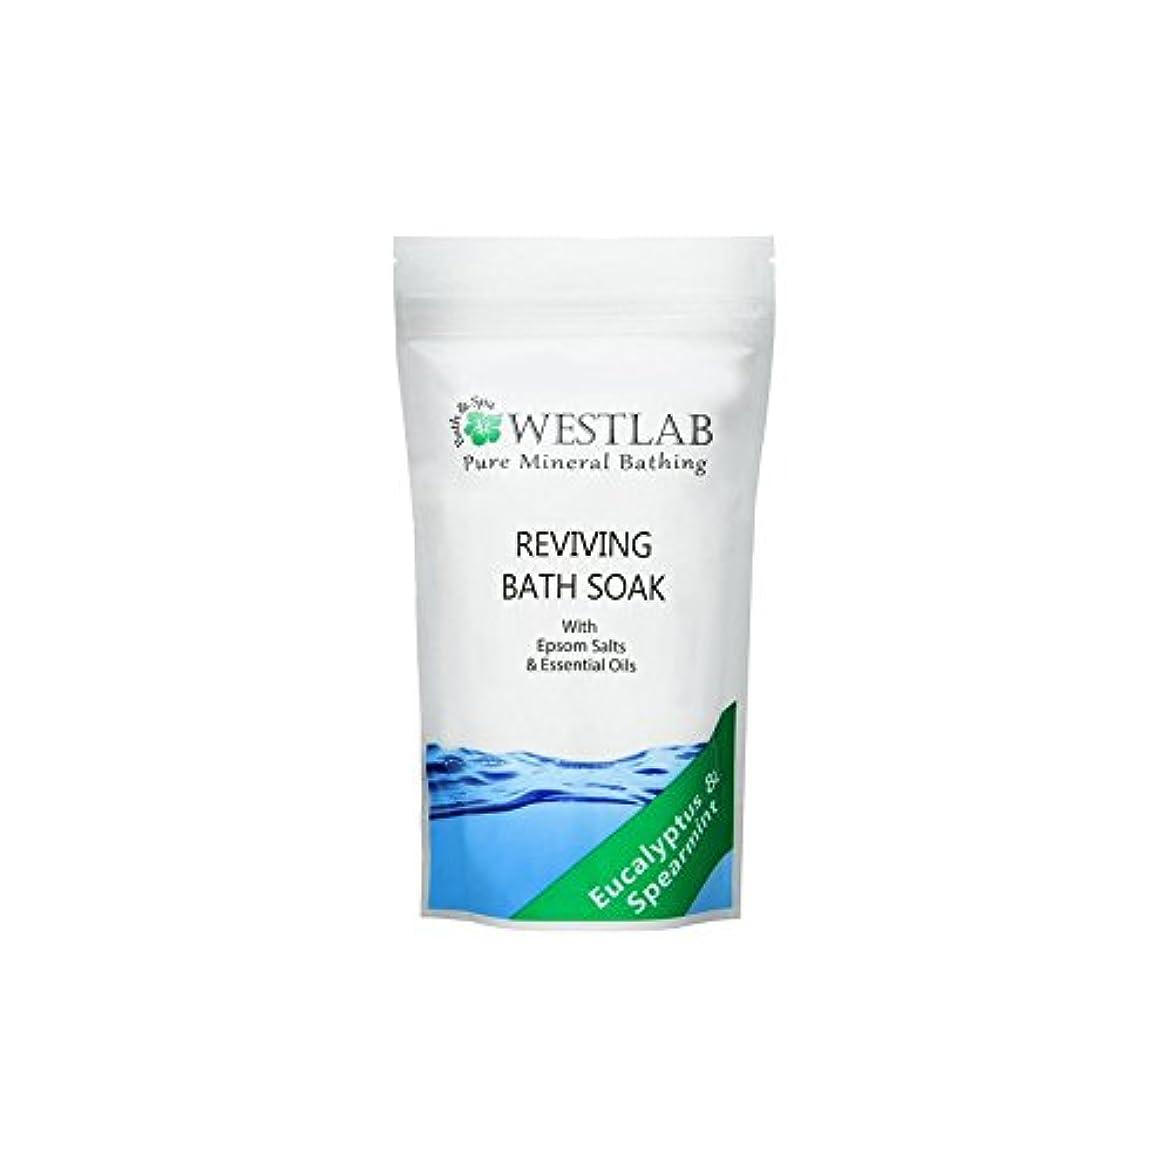 Westlab Revive Epsom Salt Bath Soak (500g) - (500グラム)をソークエプソム塩浴を復活させます [並行輸入品]